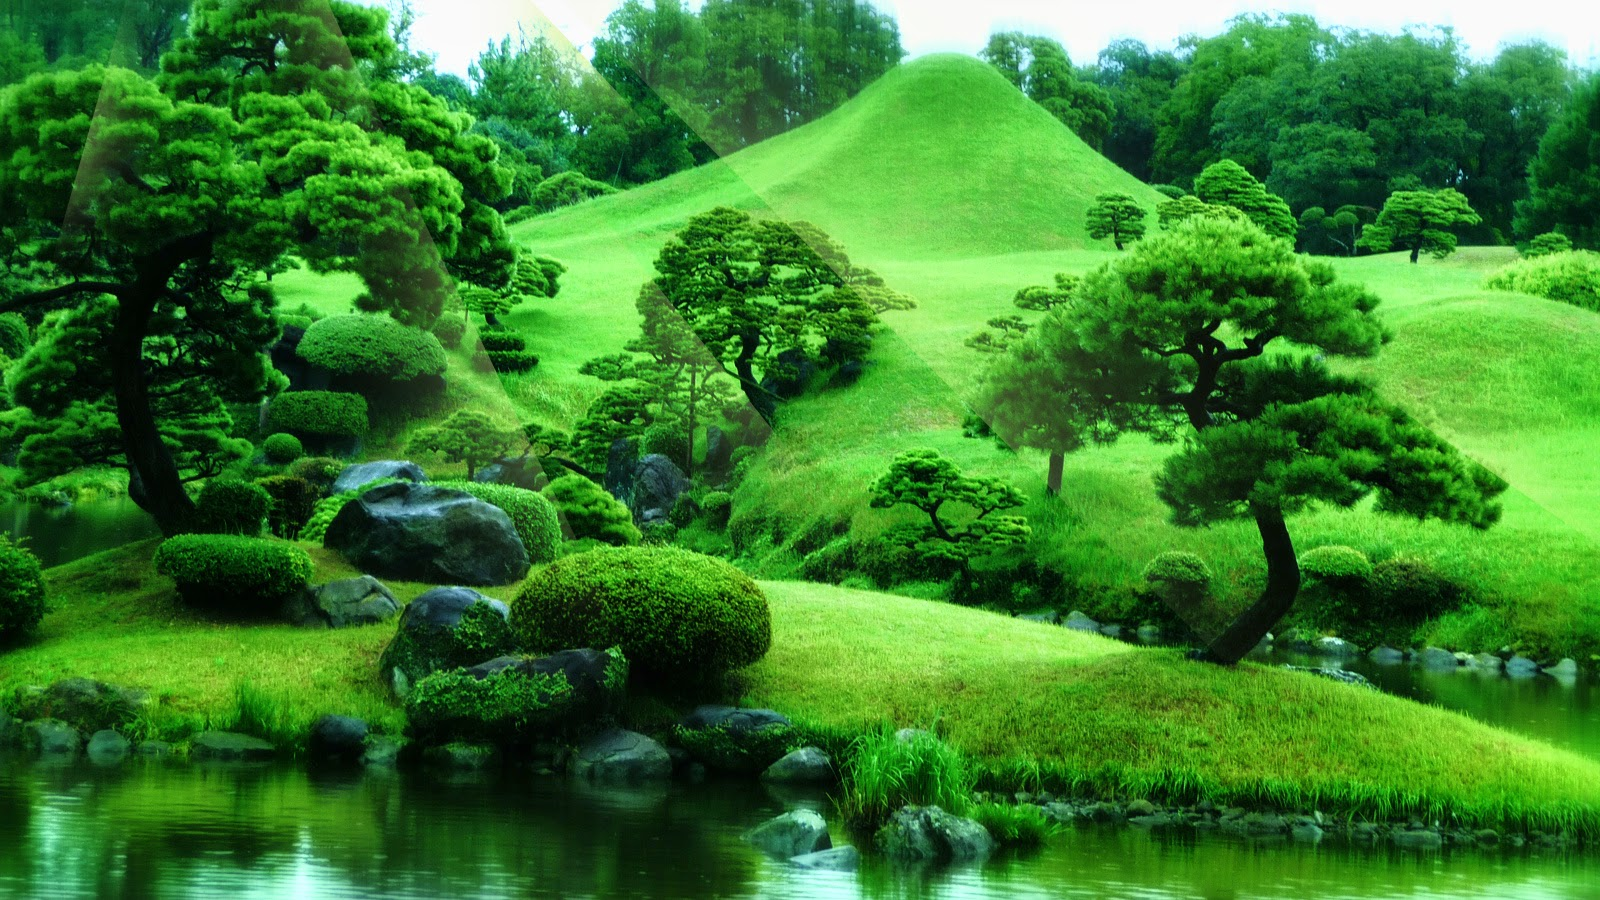 E ku reo 132 jard n zen ii for Figuras para jardin zen